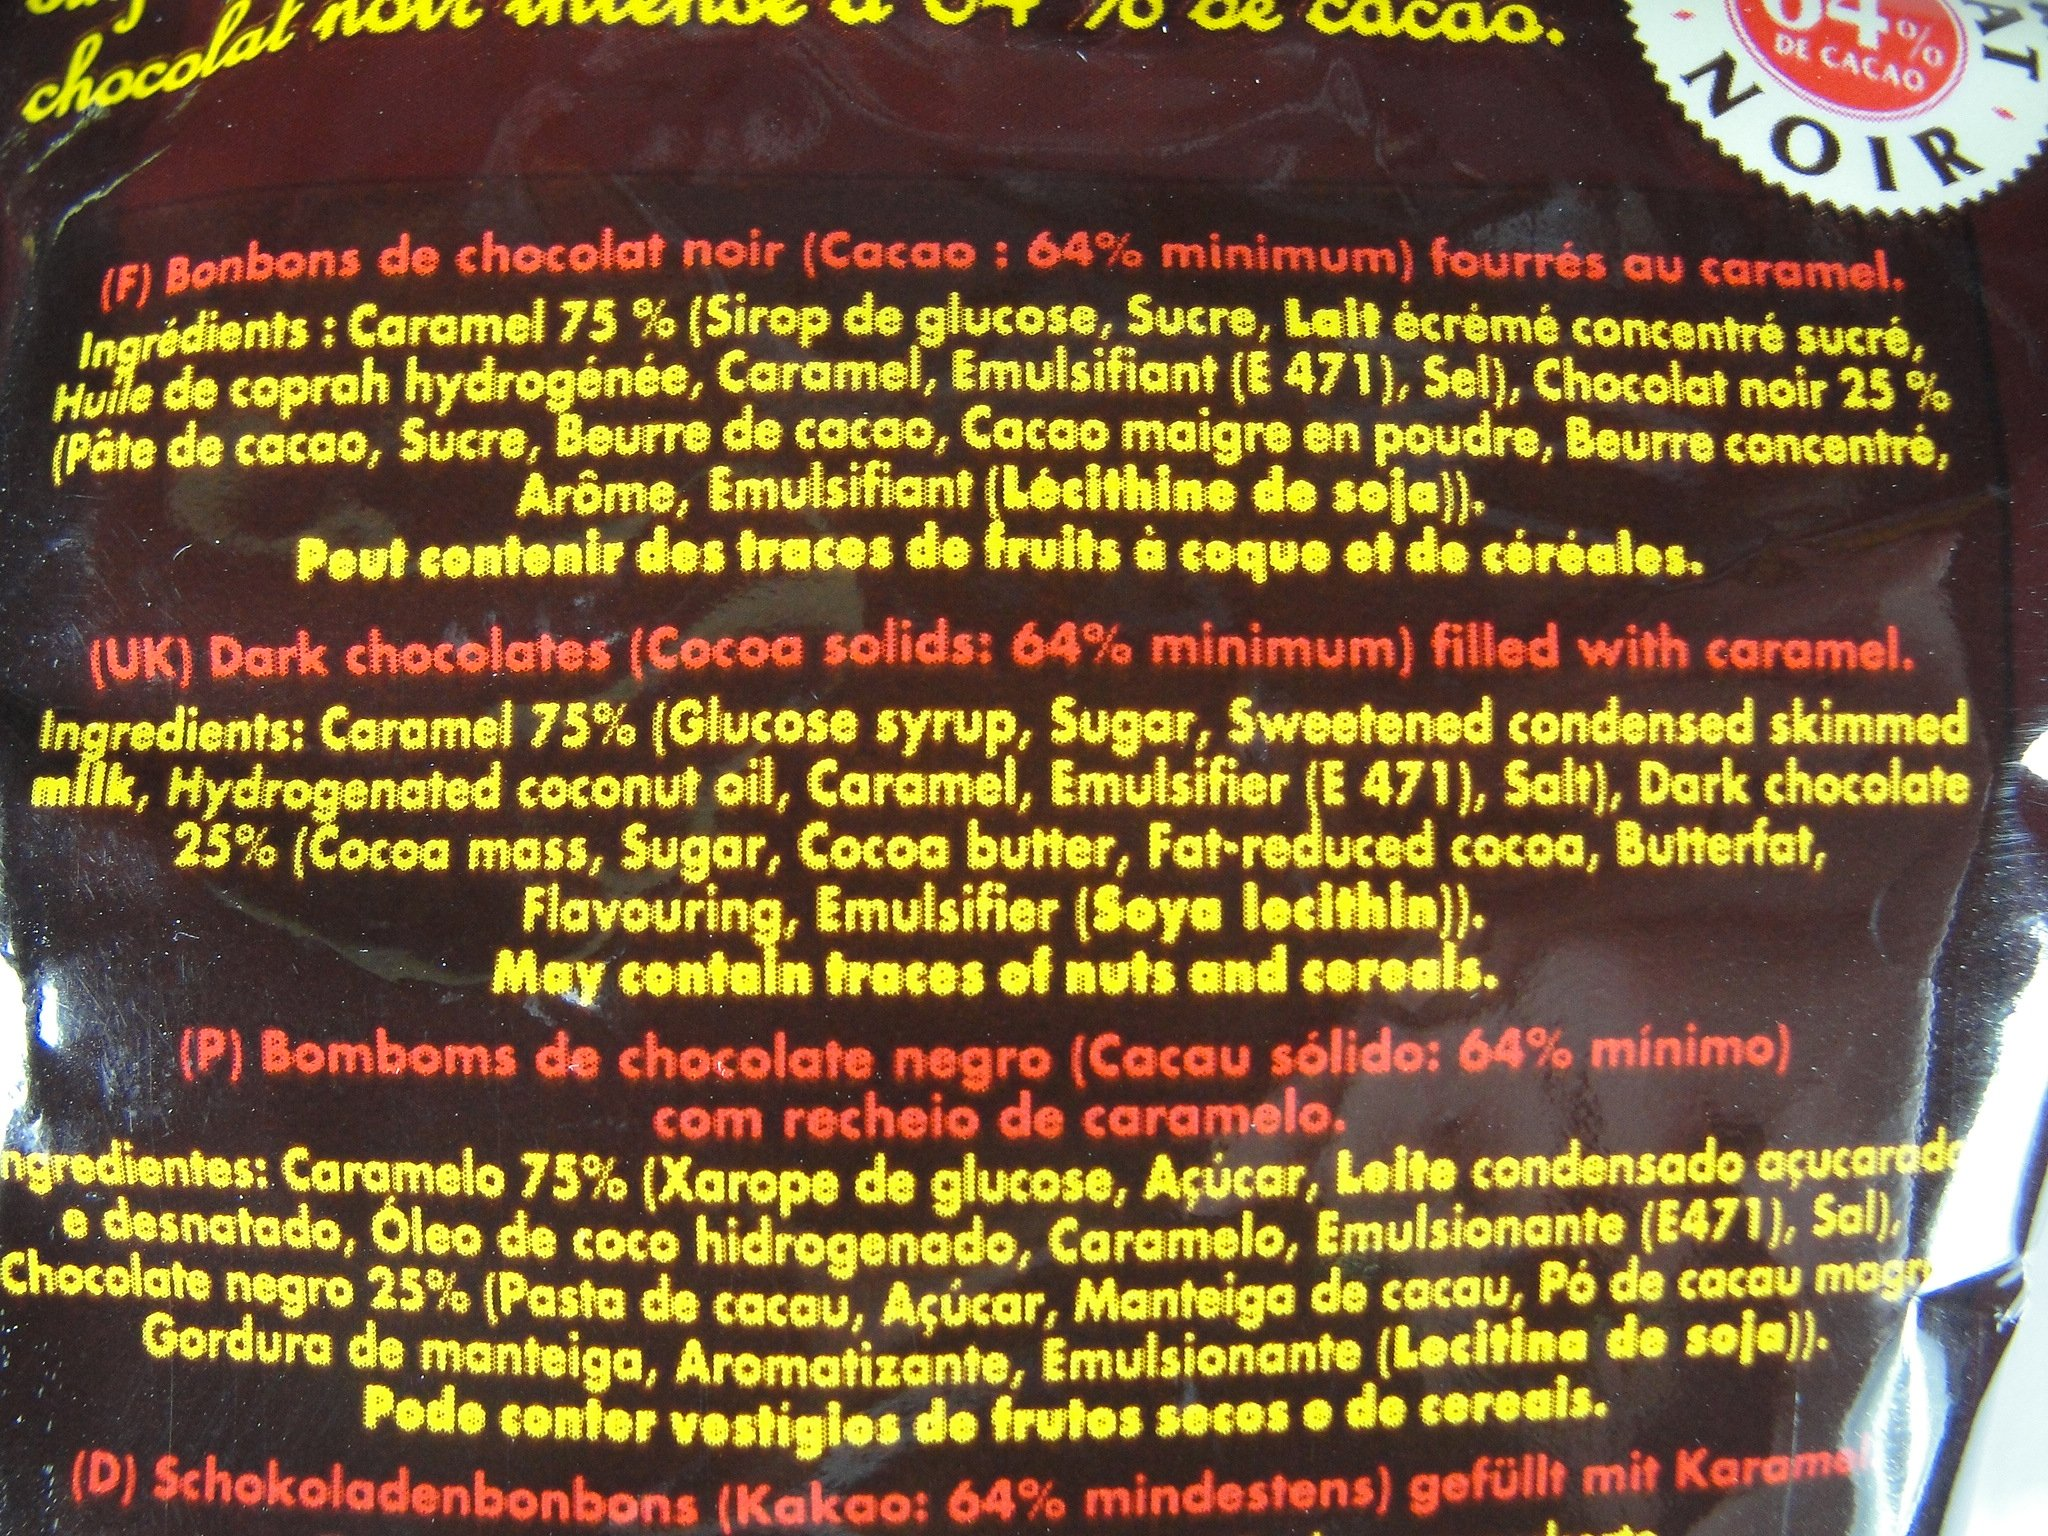 Michoko Caramel Candies From France, 100 gr 3.5 oz bag, Six by La Pie qui Chante